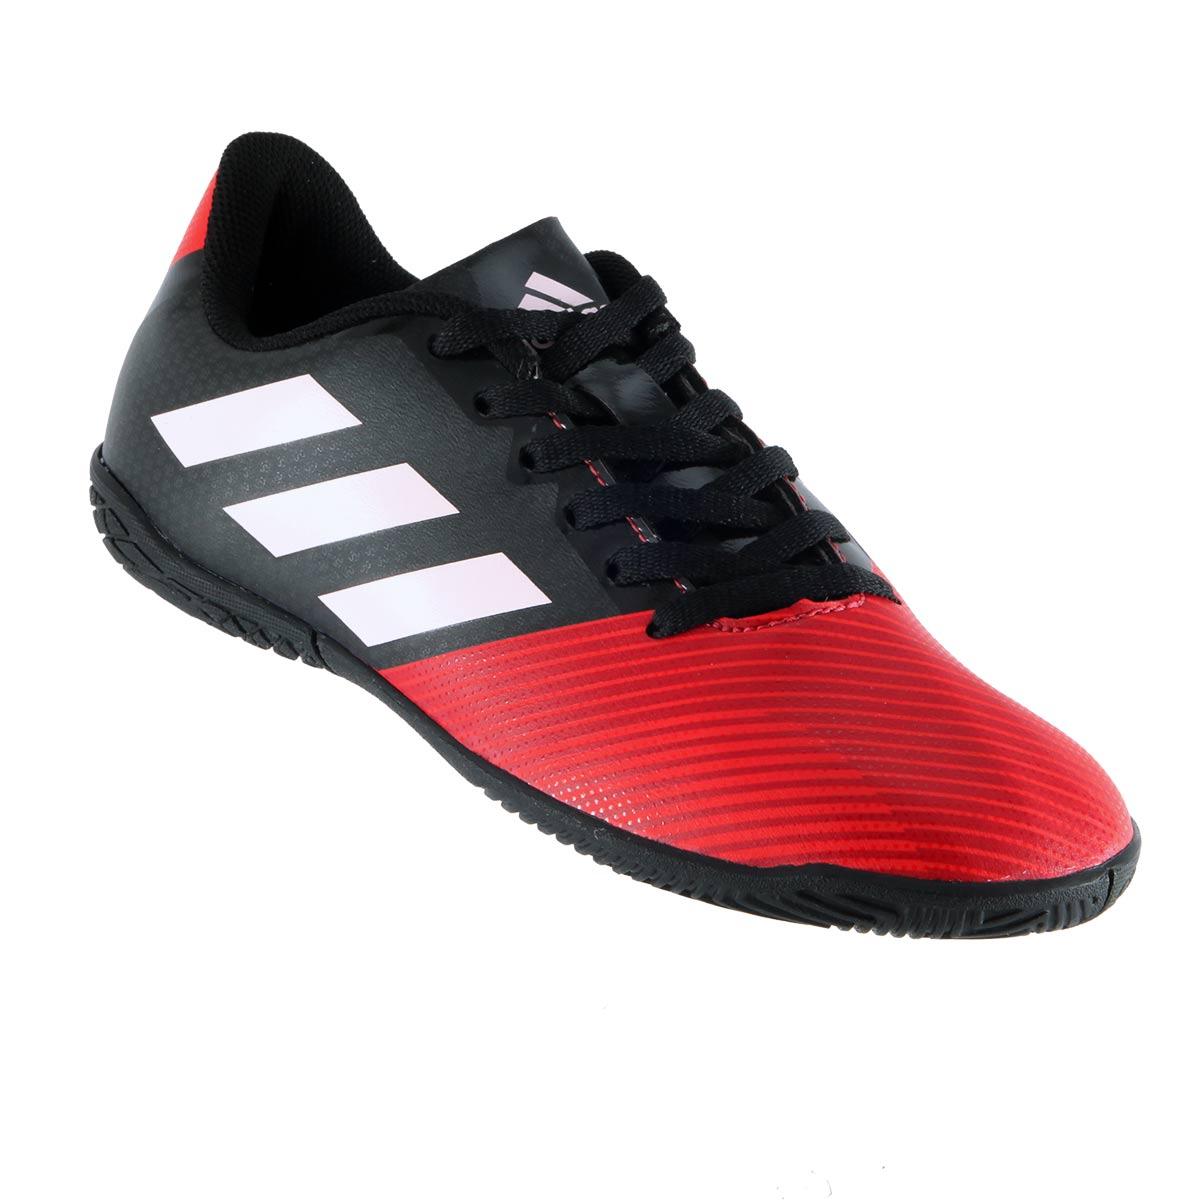 Chuteira Adidas Artilheira 17 IN Futsal Juvenil H68441 H68443